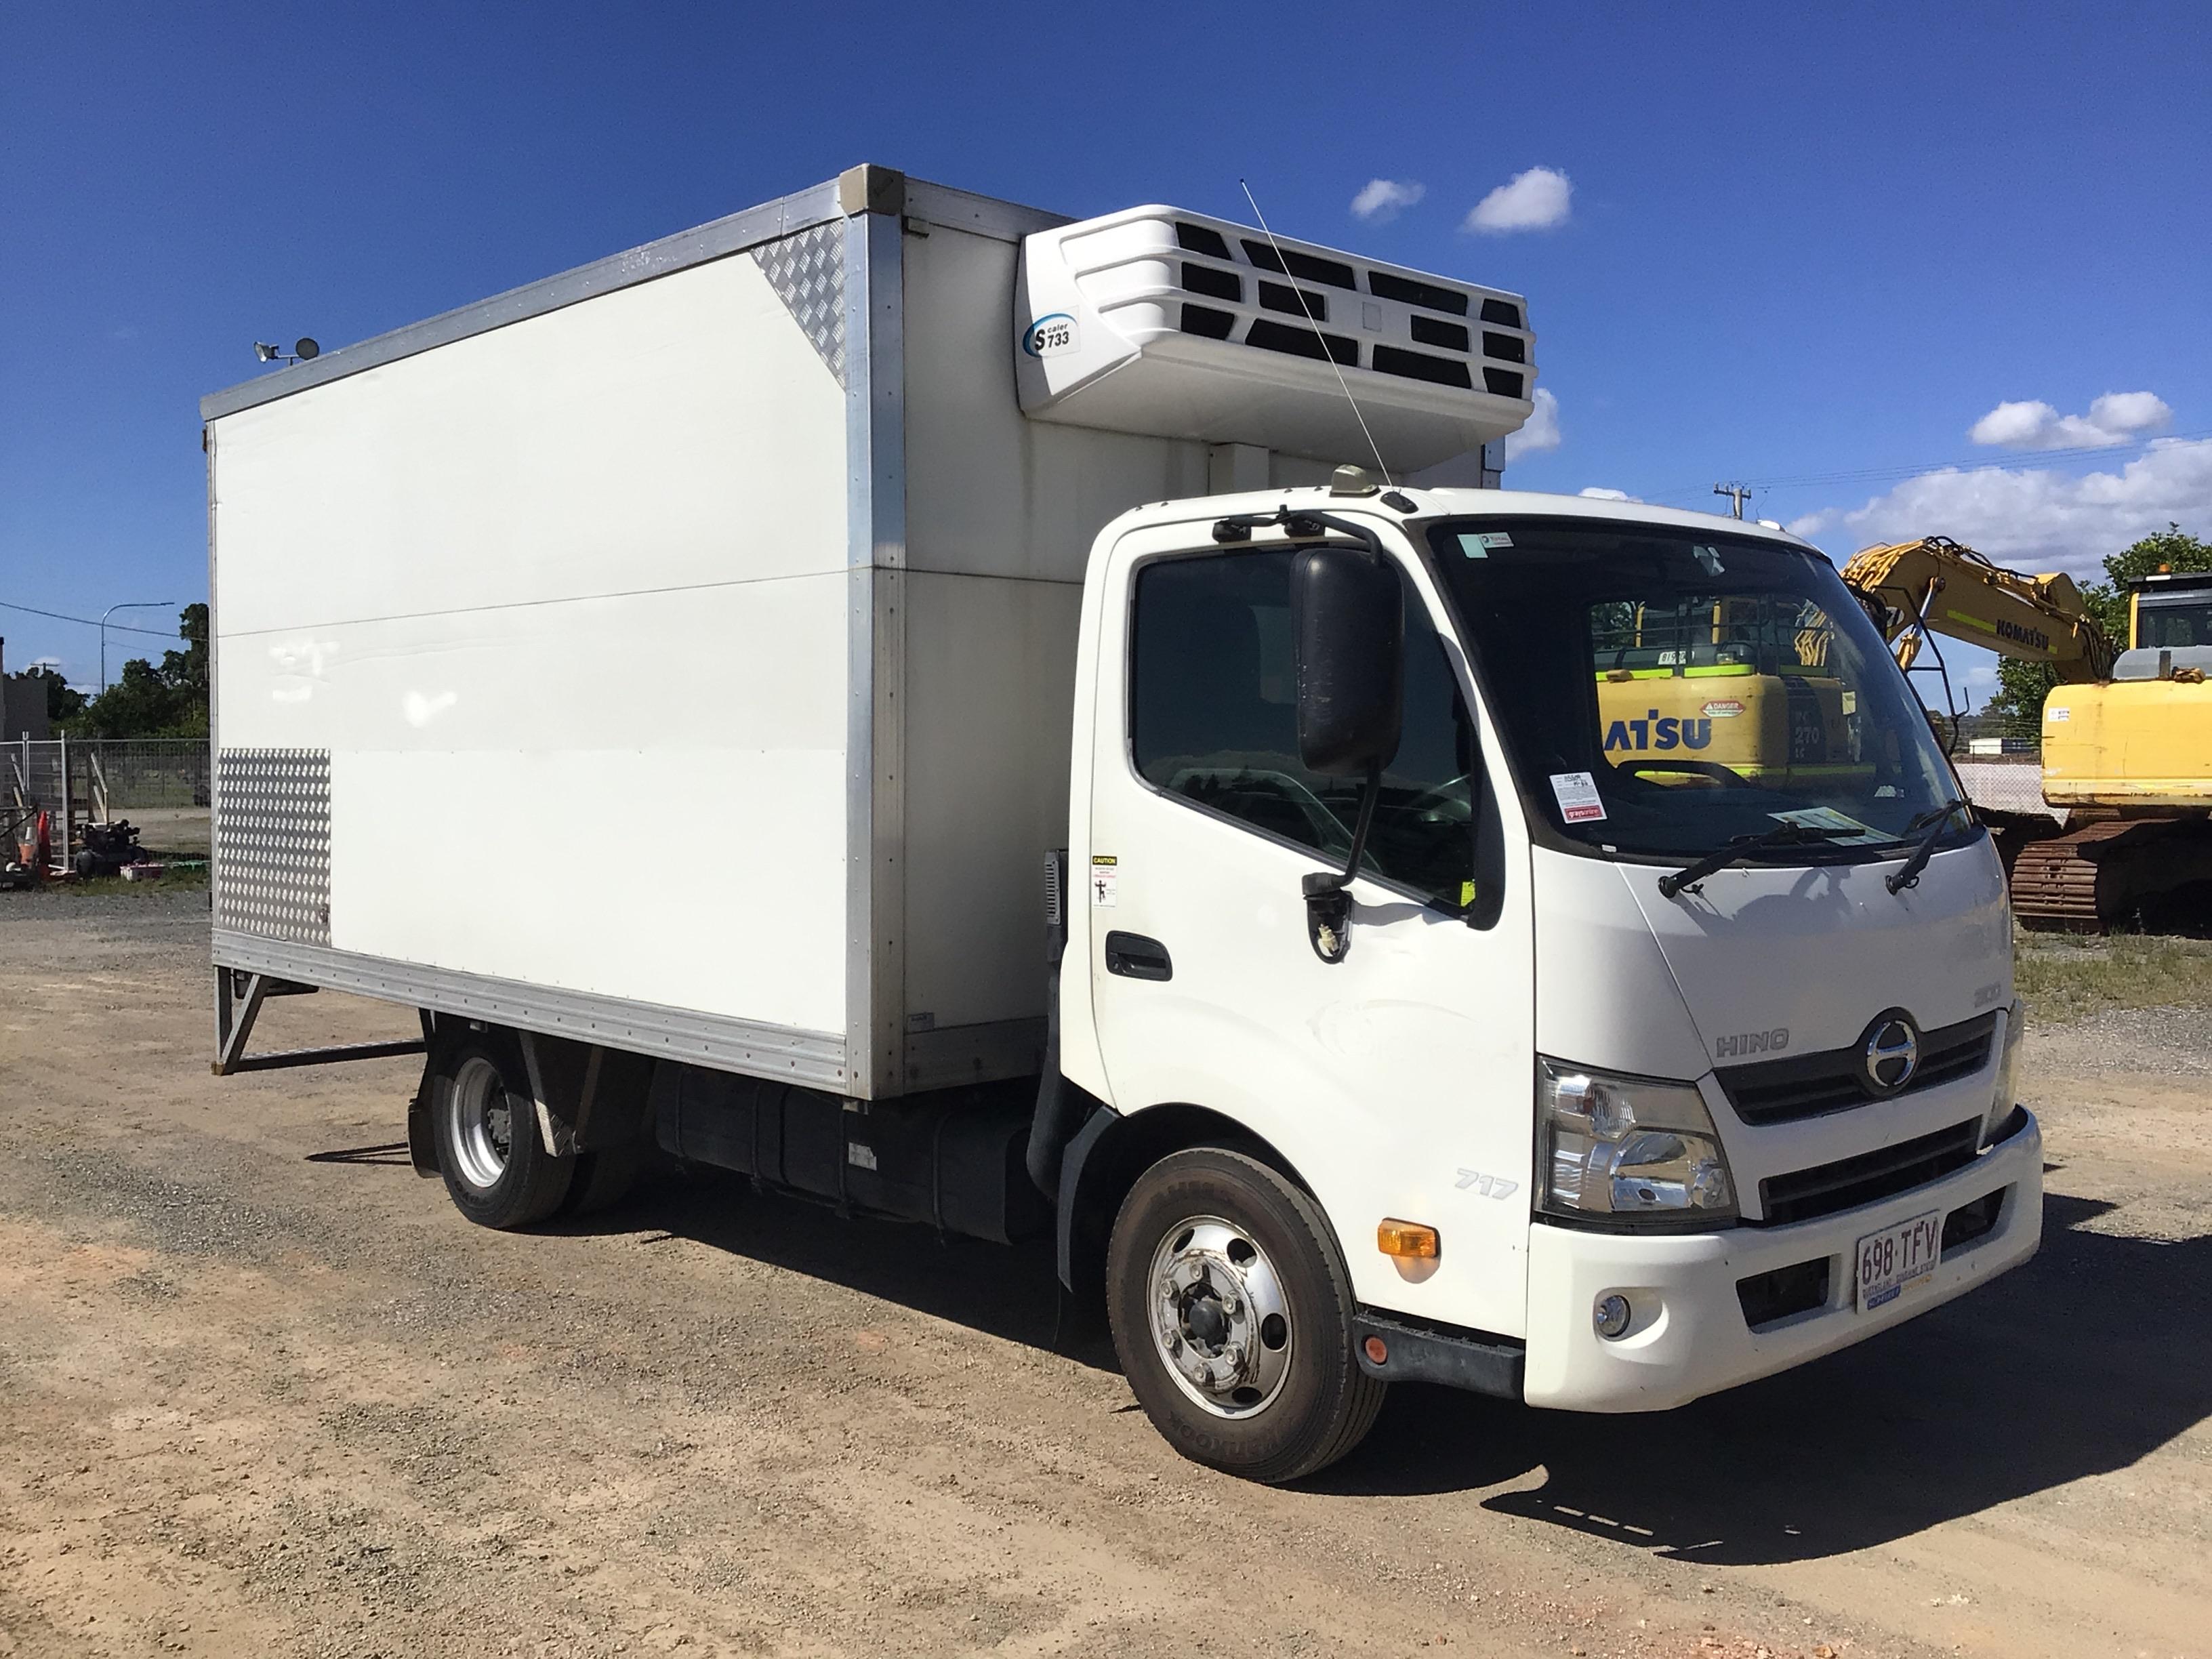 2013 Hino 300 4 x 2 Refrigerated Body Truck